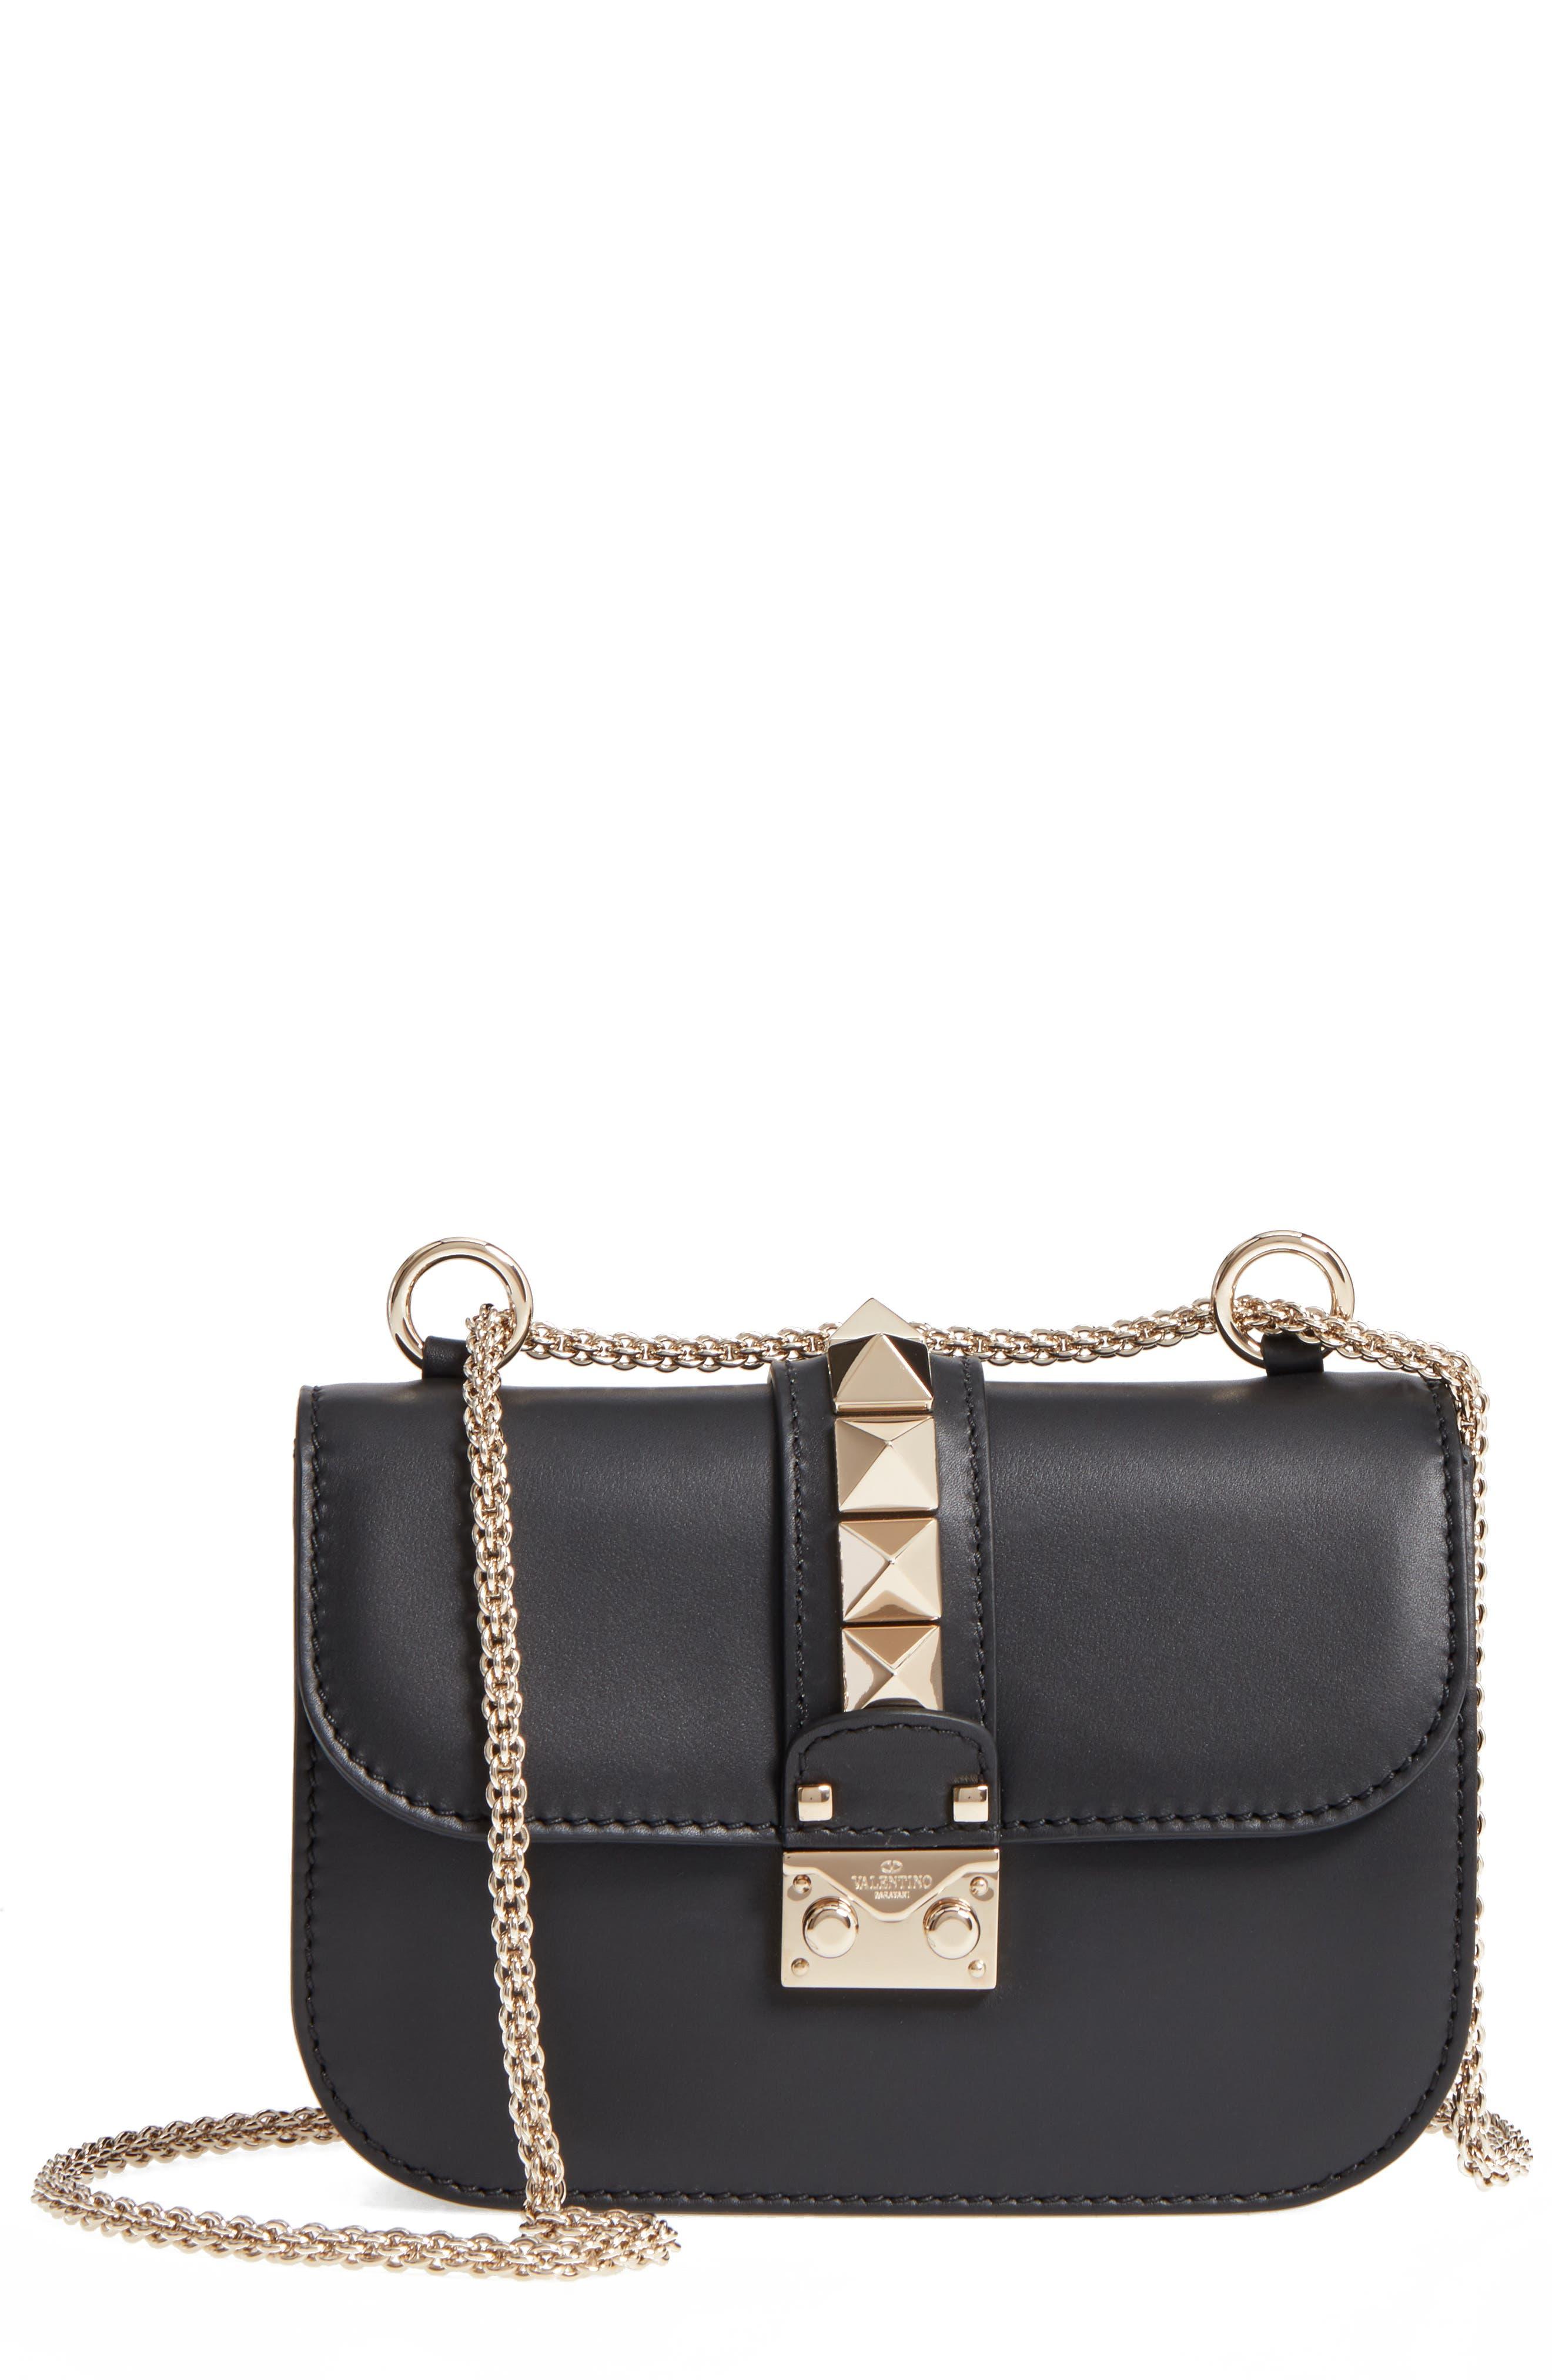 Small Lock Leather Crossbody Bag,                         Main,                         color, NERO